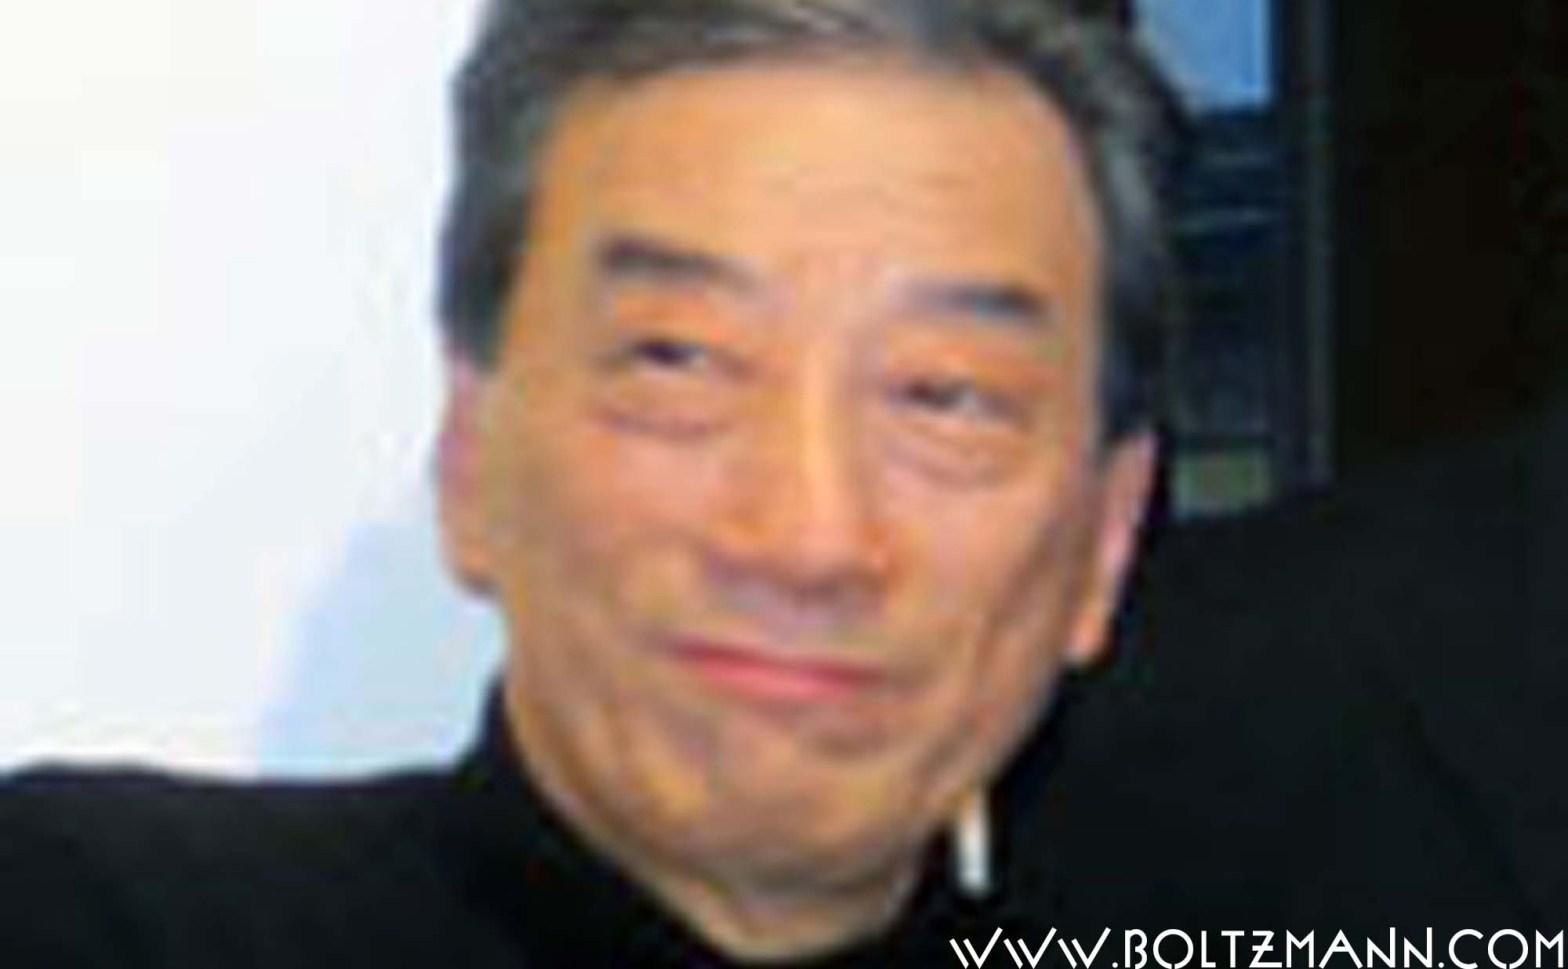 Groupthink can kill - Fukushima Accident Investigation Chairman Kiyoshi Kurokawa